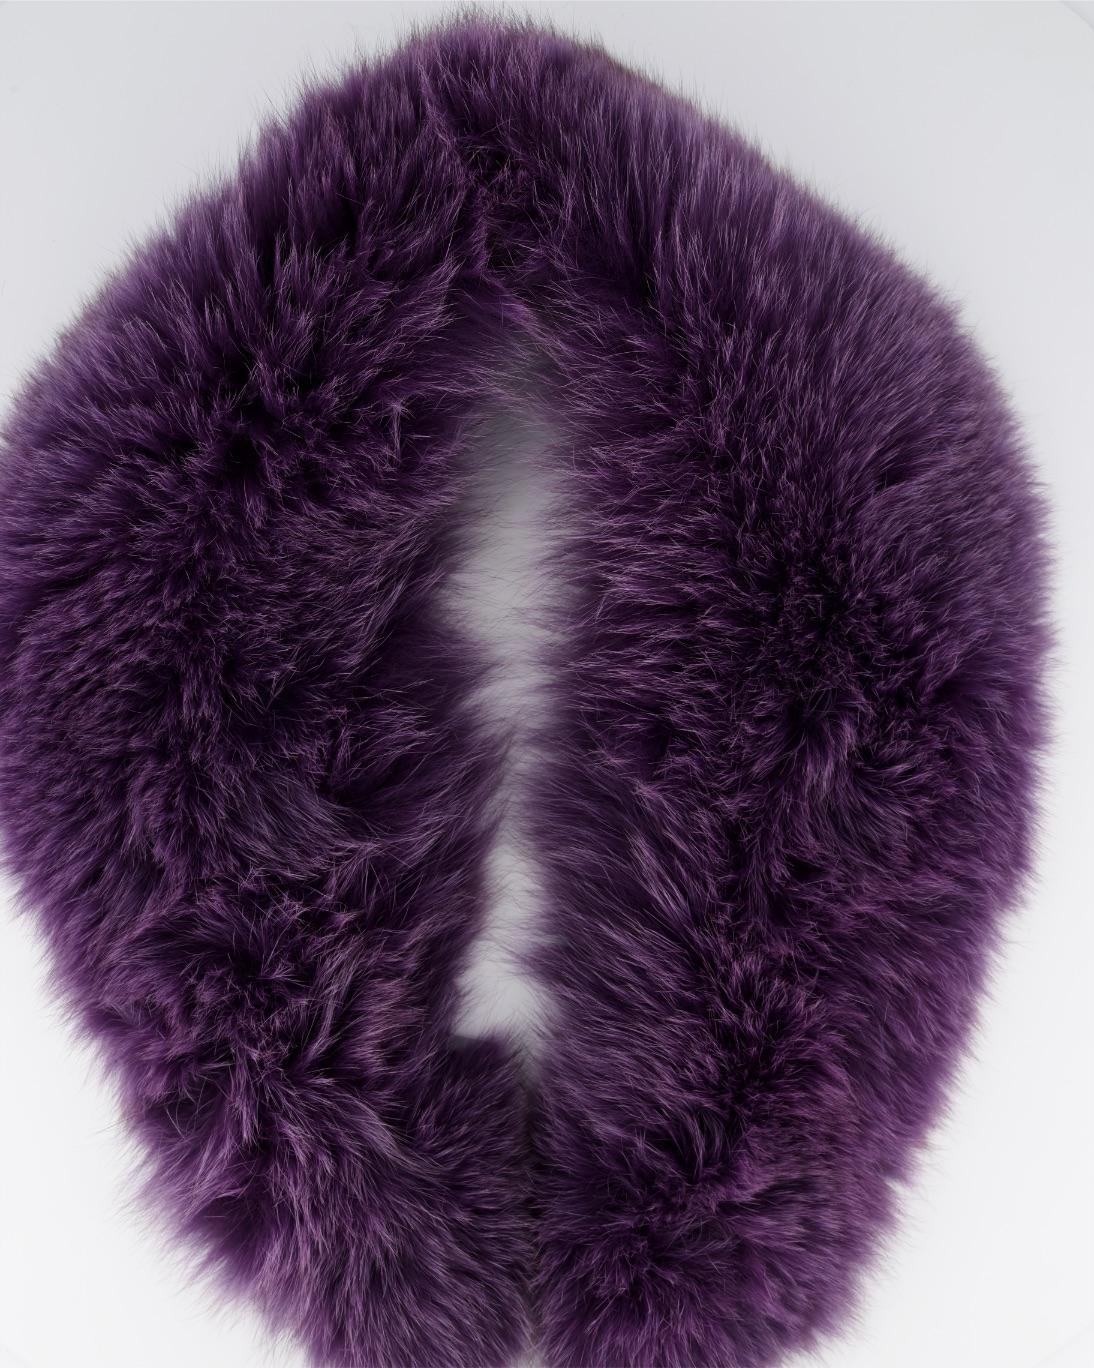 purple fox-Top-jpg-1